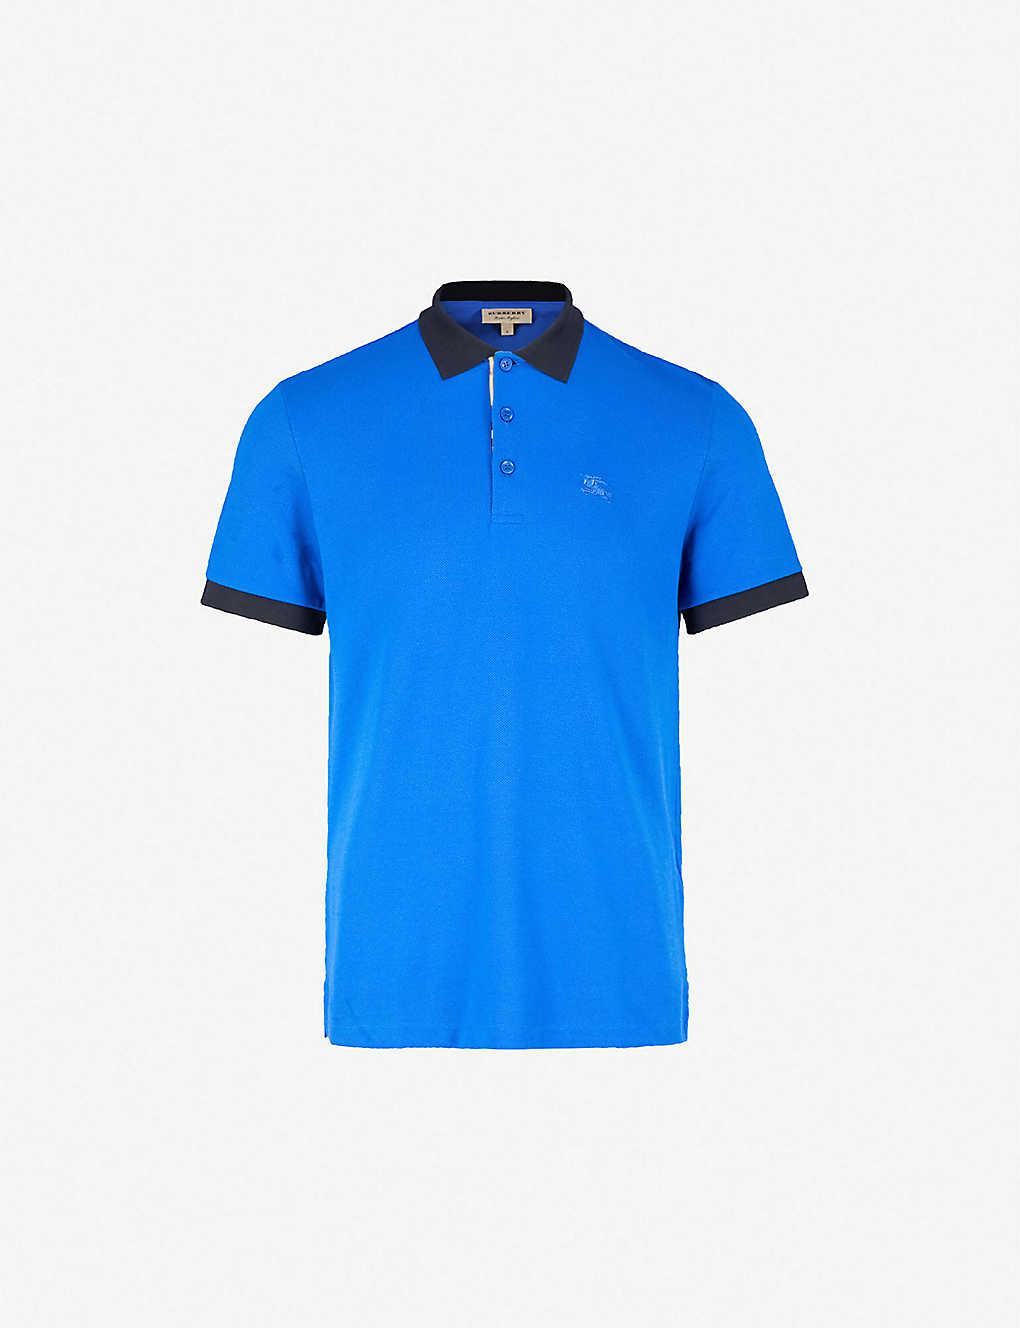 b82d88c4 BURBERRY - Hartford cotton-piqué polo shirt | Selfridges.com